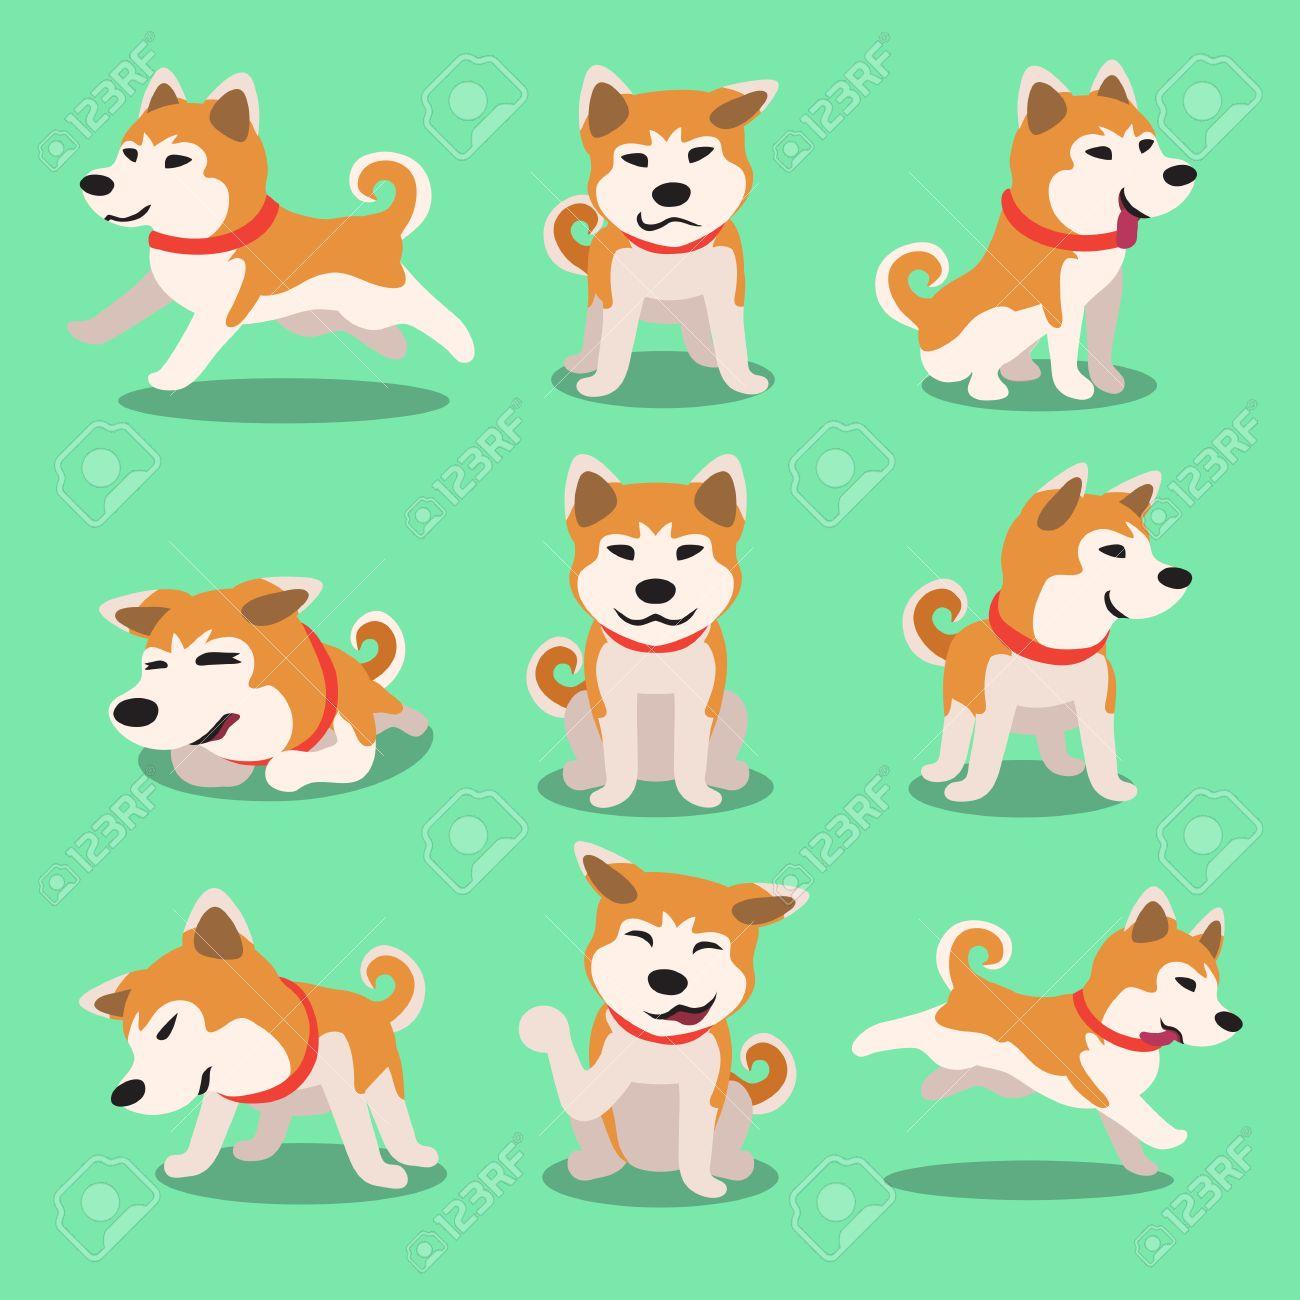 Cartoon character akita inu dog poses - 51904651